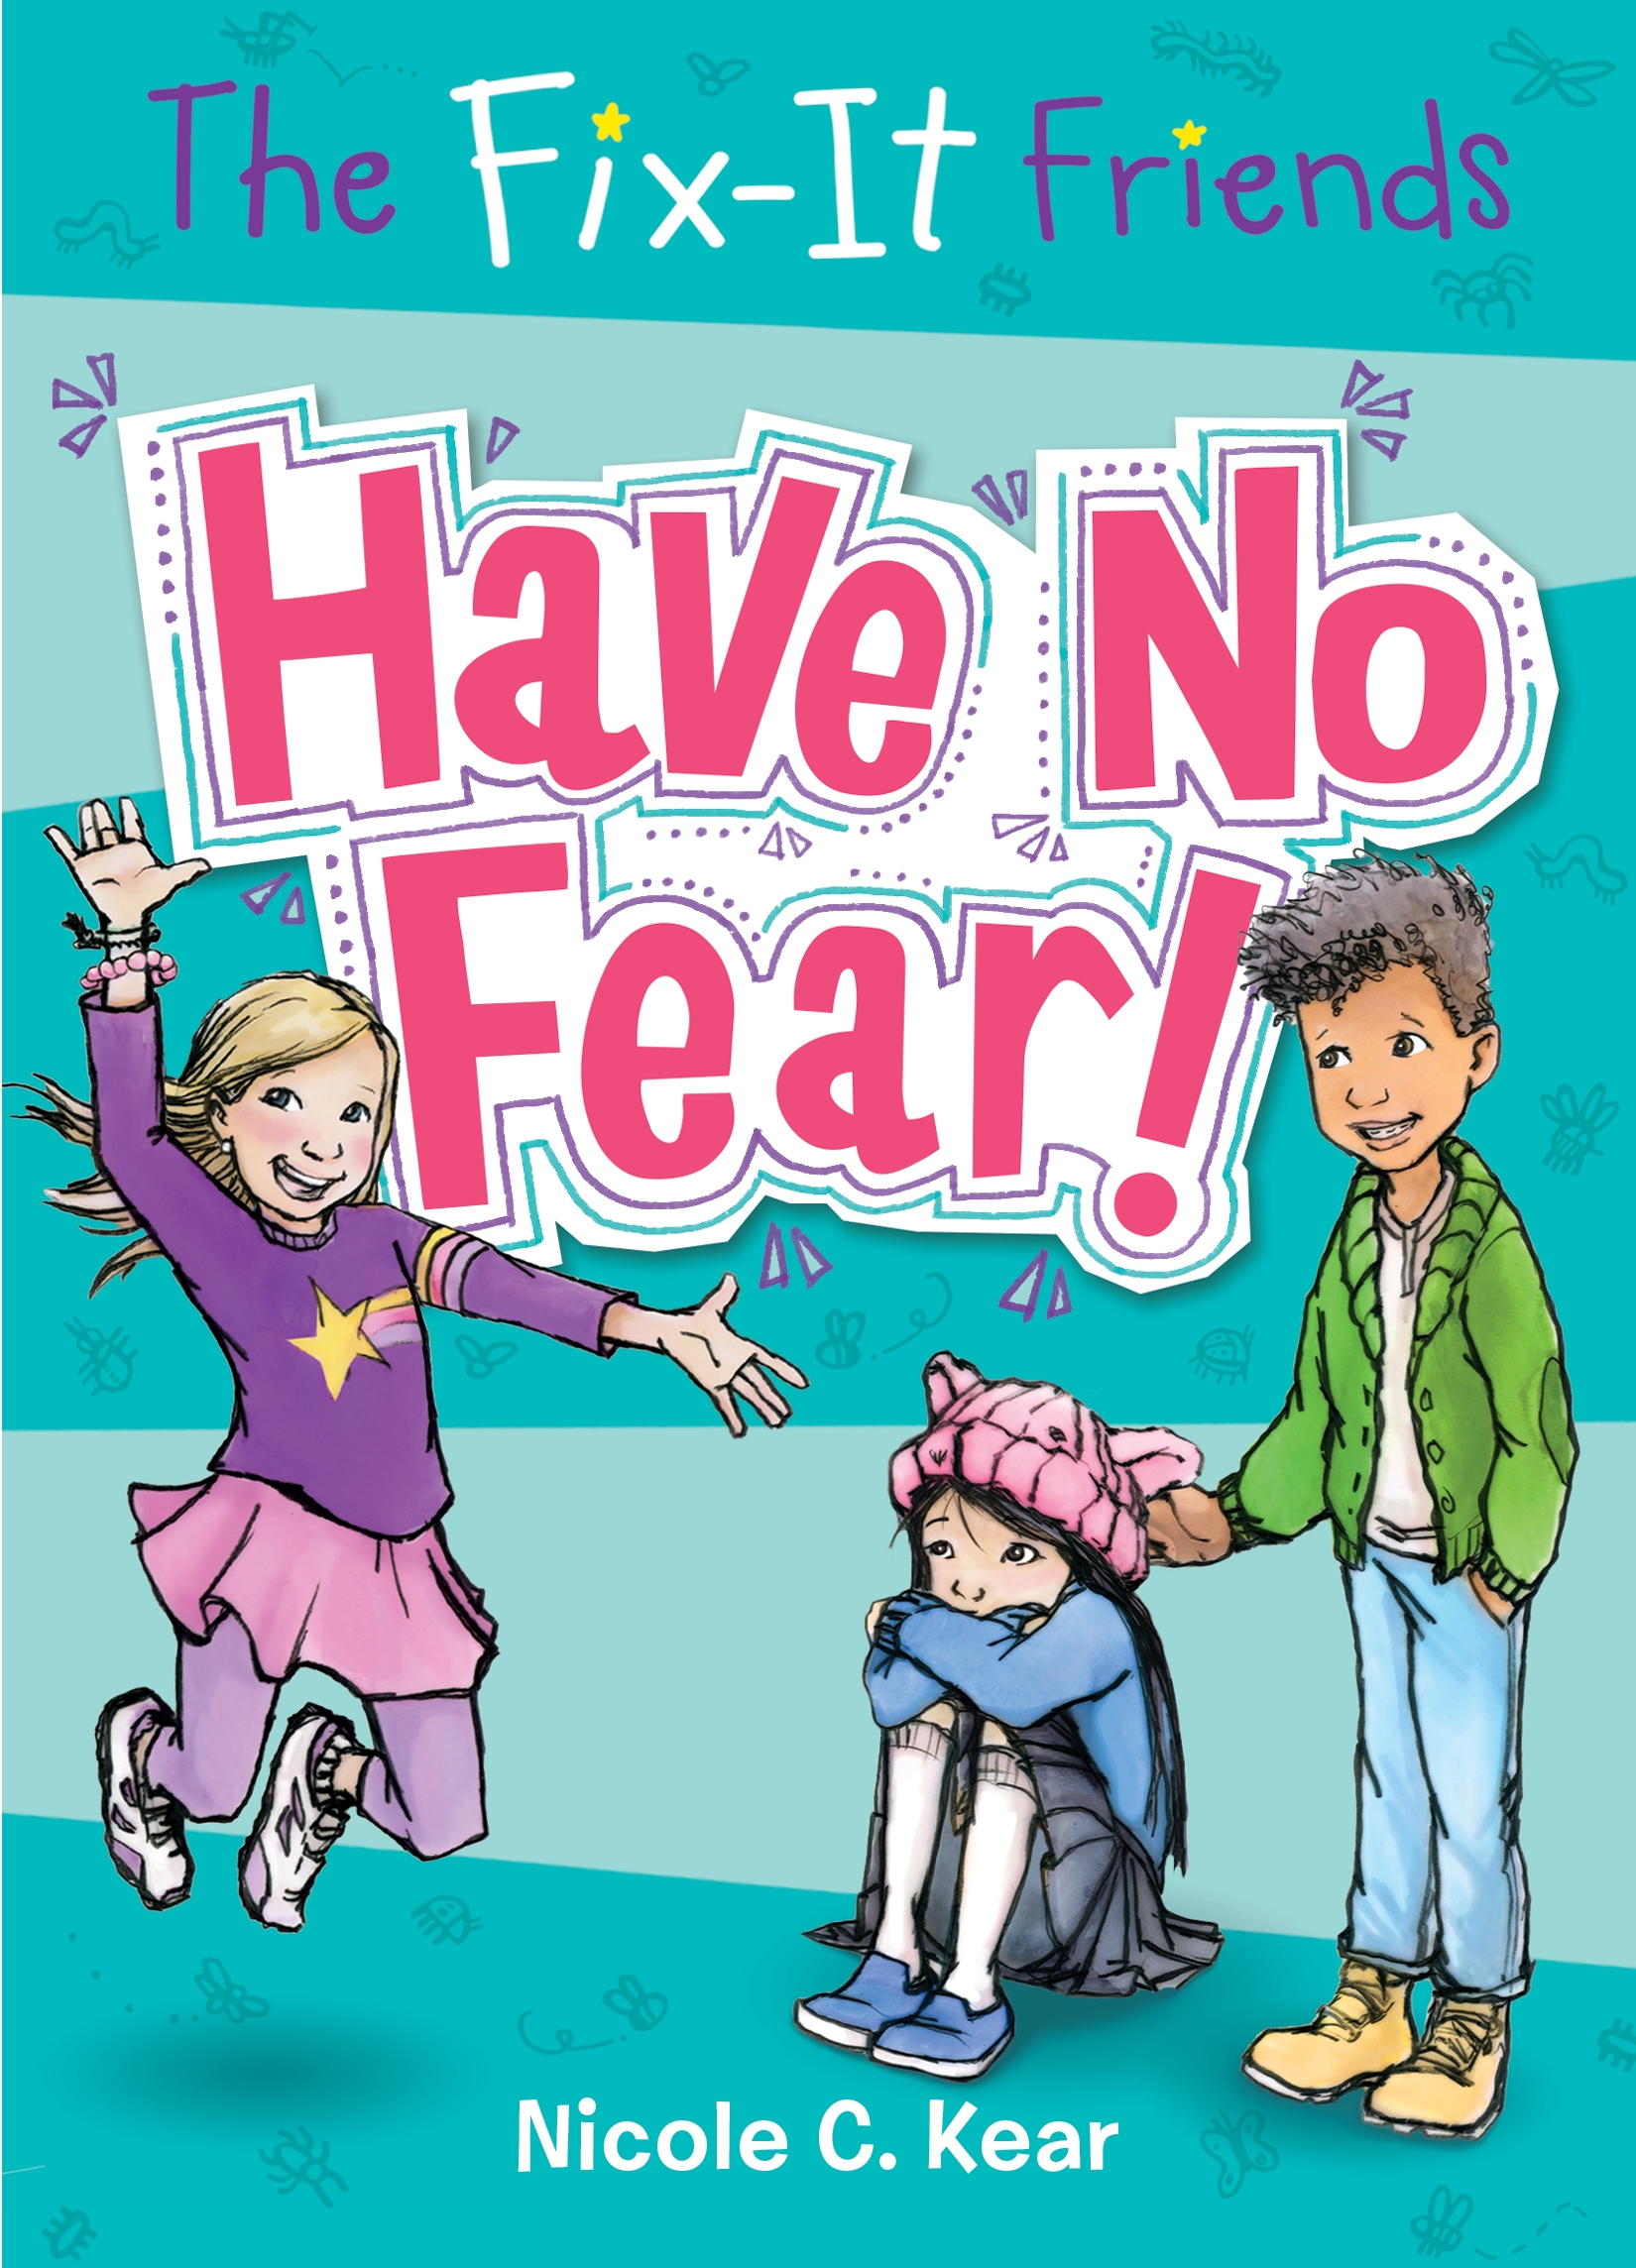 Kids' Book Event: The Fix-It Friends Series by Nicole C. Kear